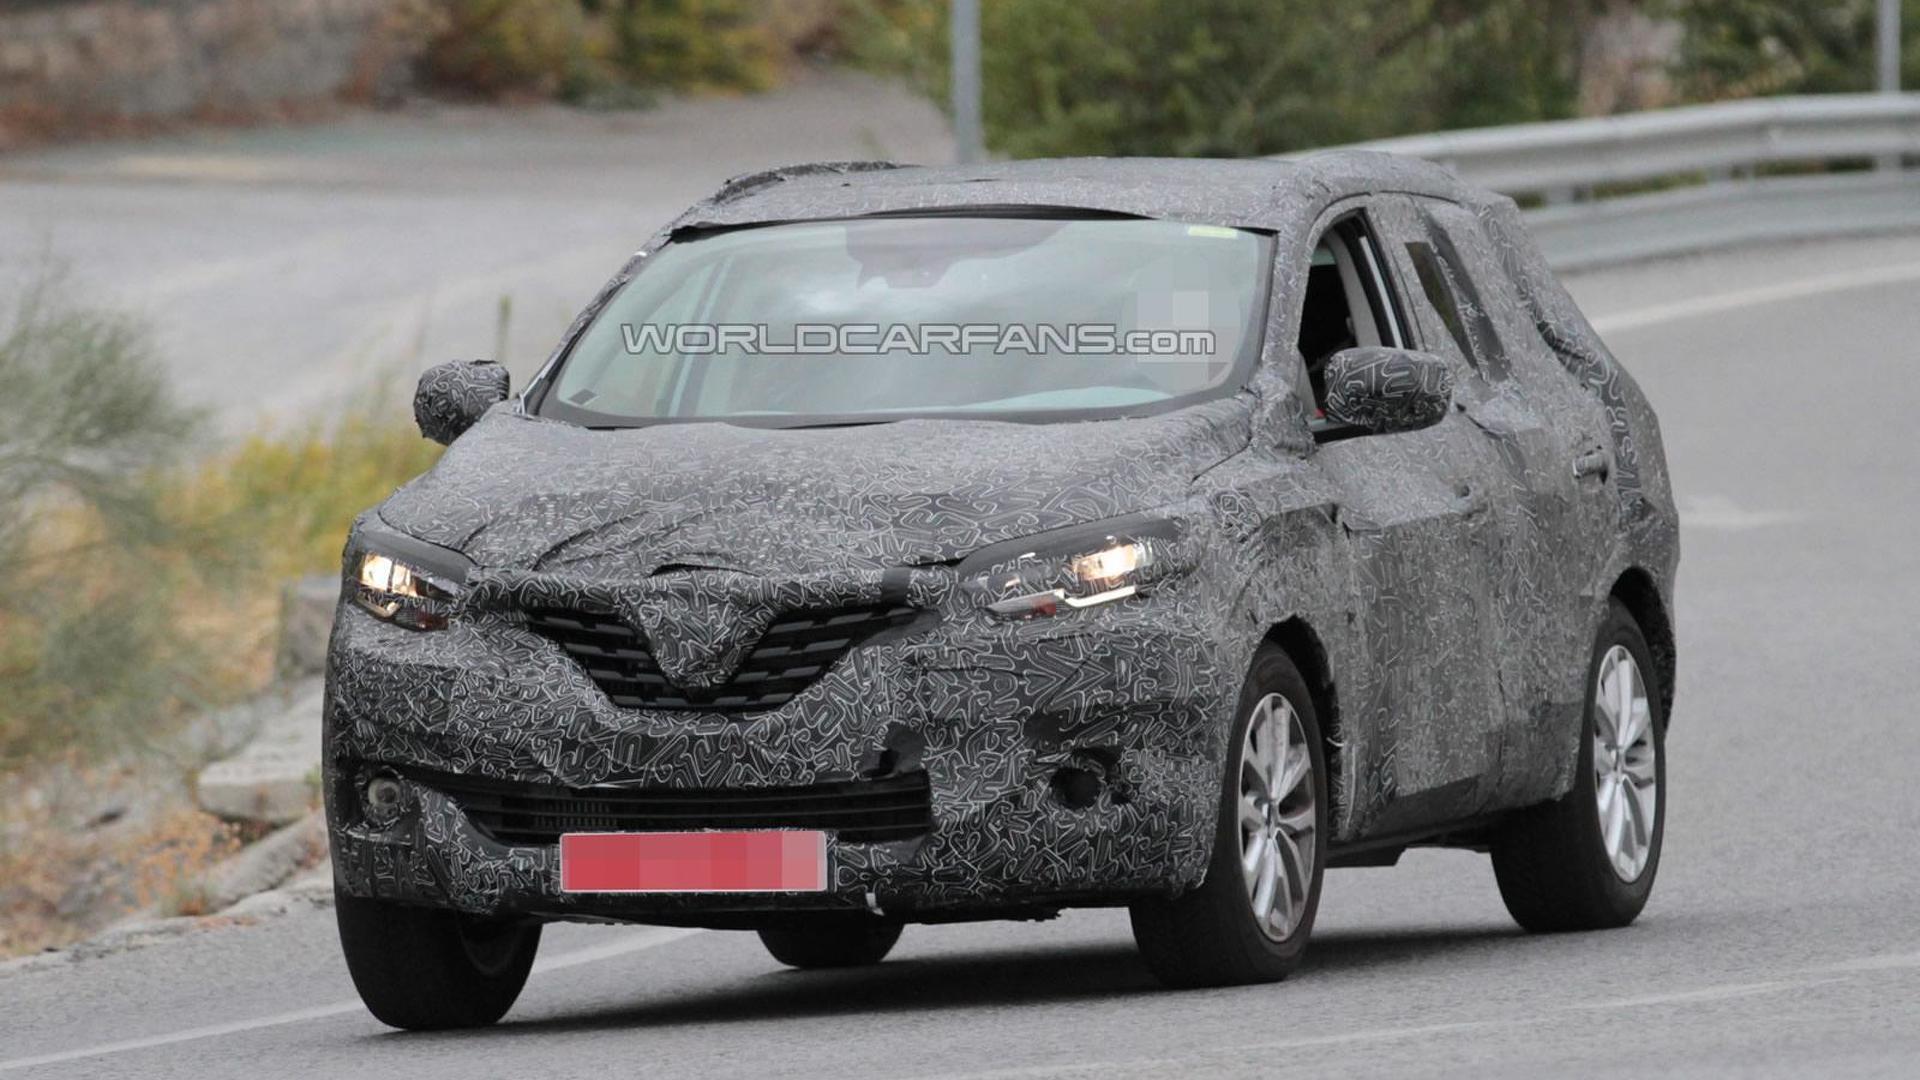 2016 Renault Koleos spied up close undergoing testing